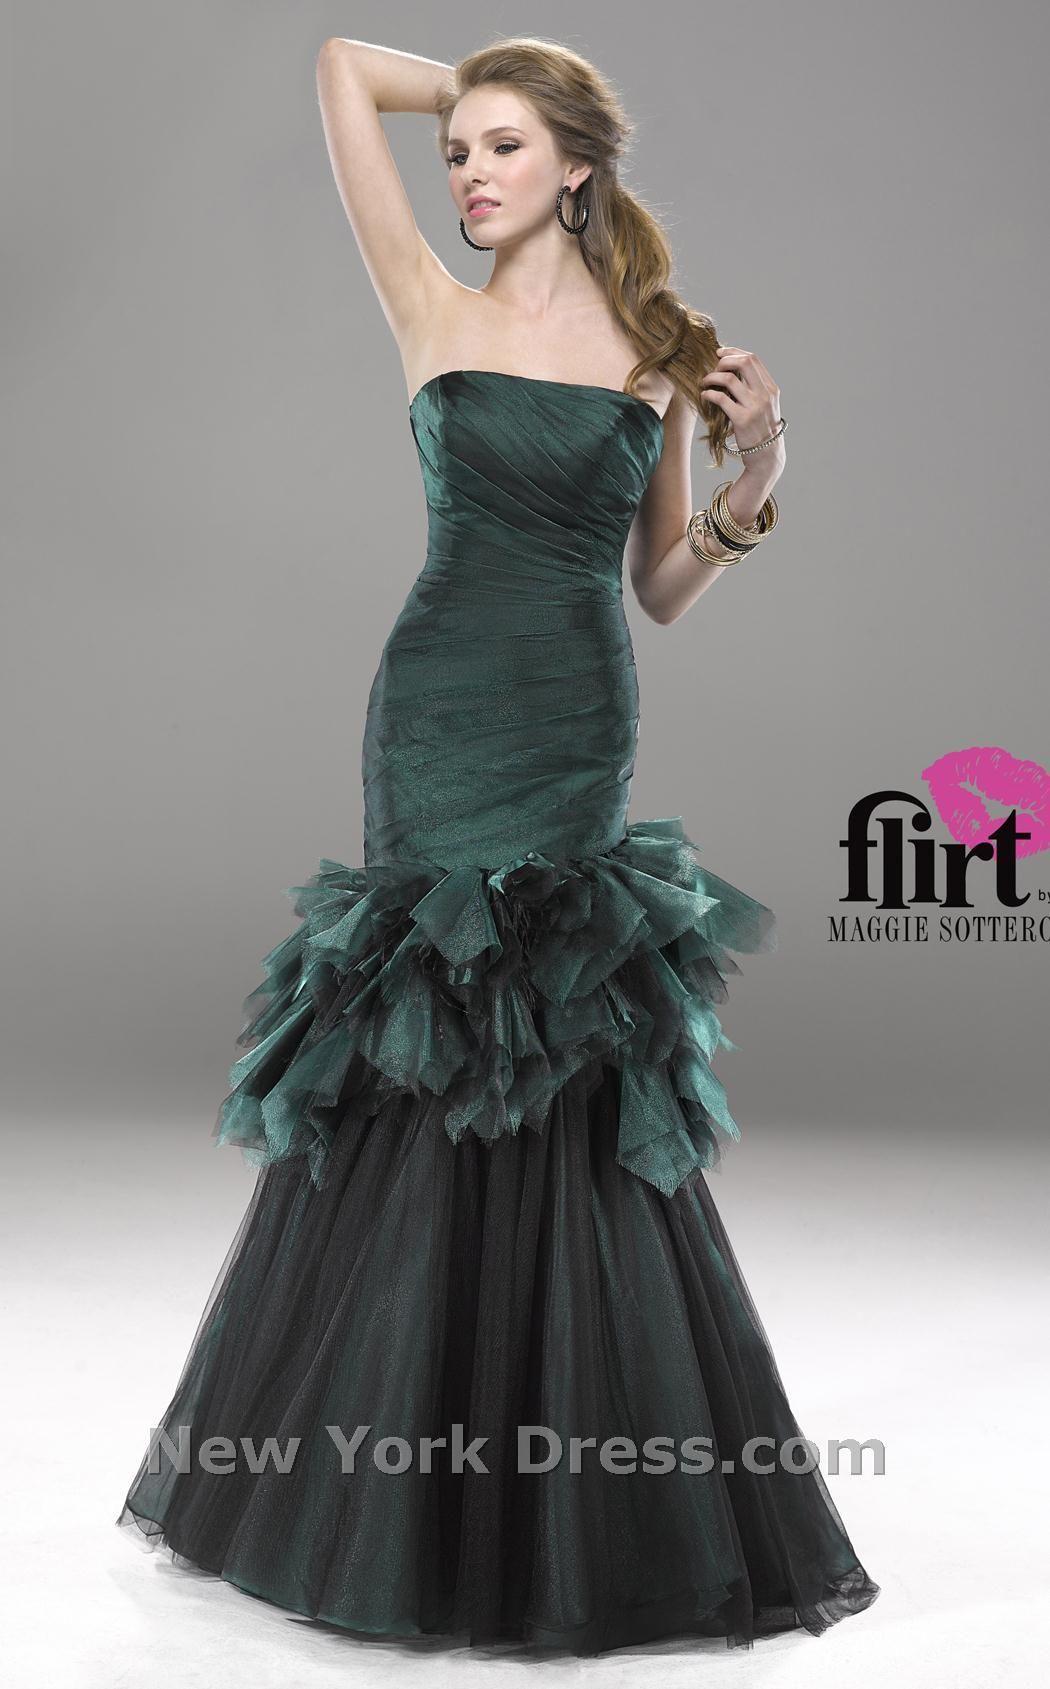 Imageswyorkdressitemsbigg fashion